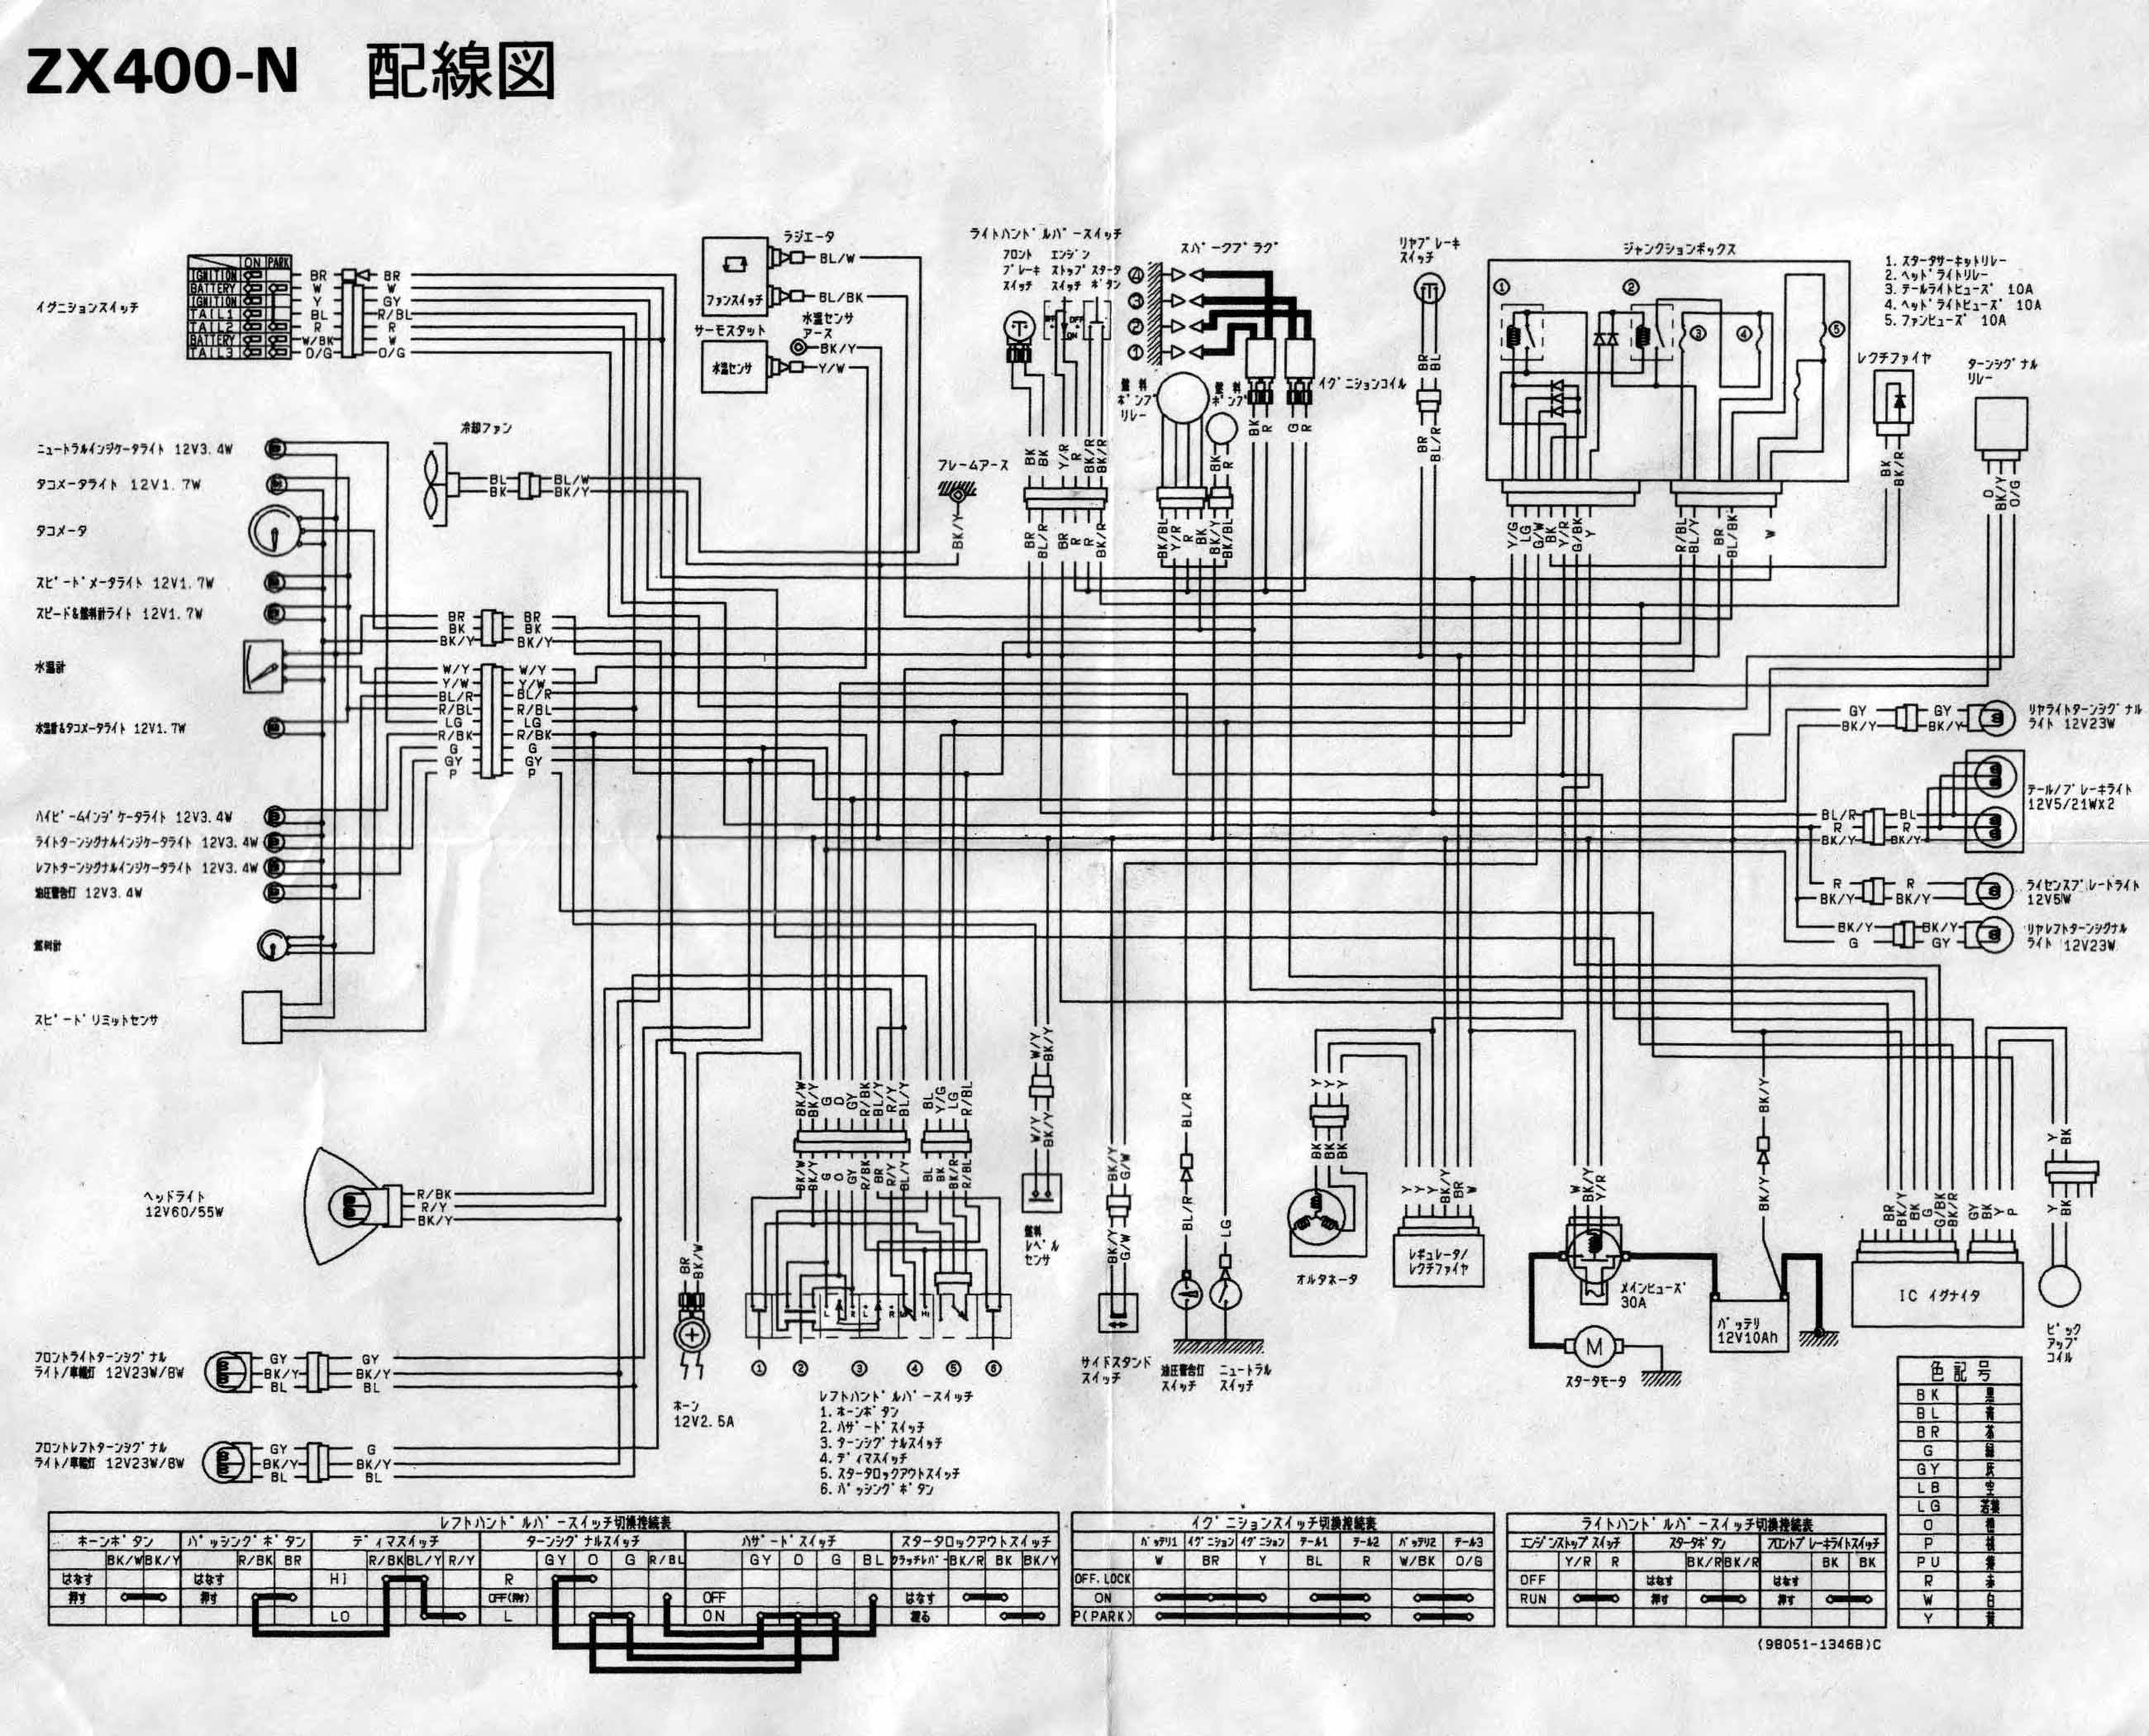 kawasaki concours wiring diagram wire center u2022 rh ayseesra co kawasaki zx7 wiring diagram 1998 kawasaki zx7r wiring diagram